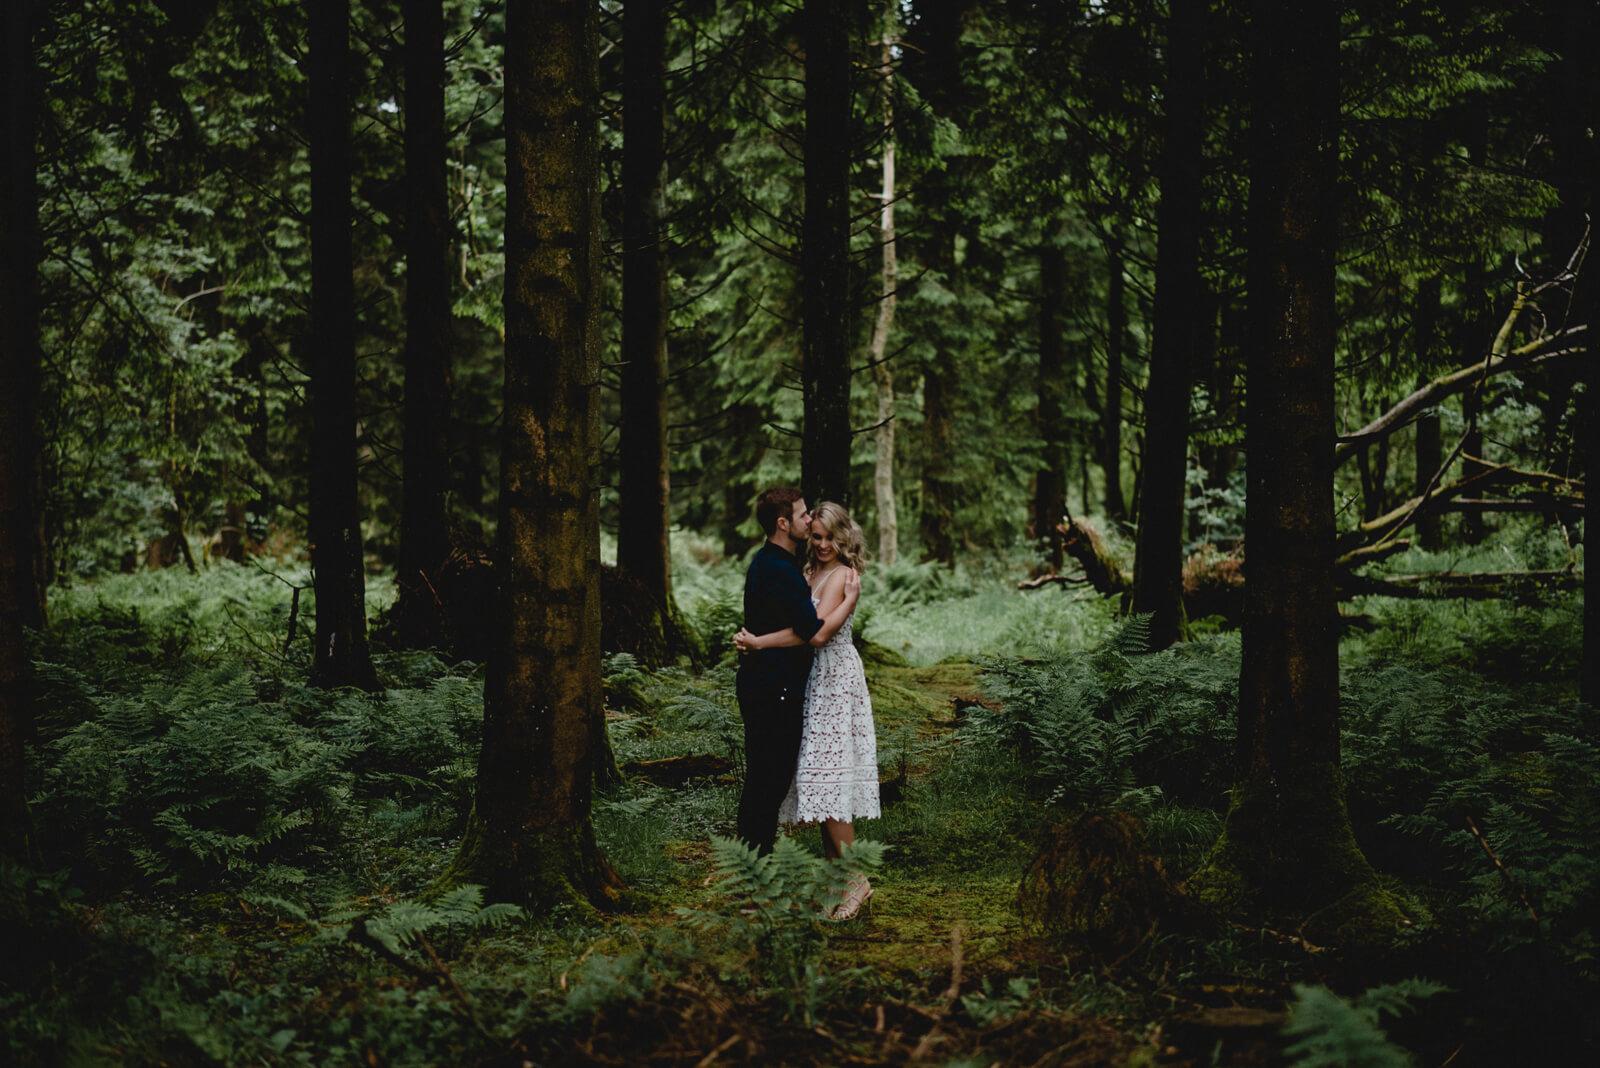 Bath bride and groom in woodland setting